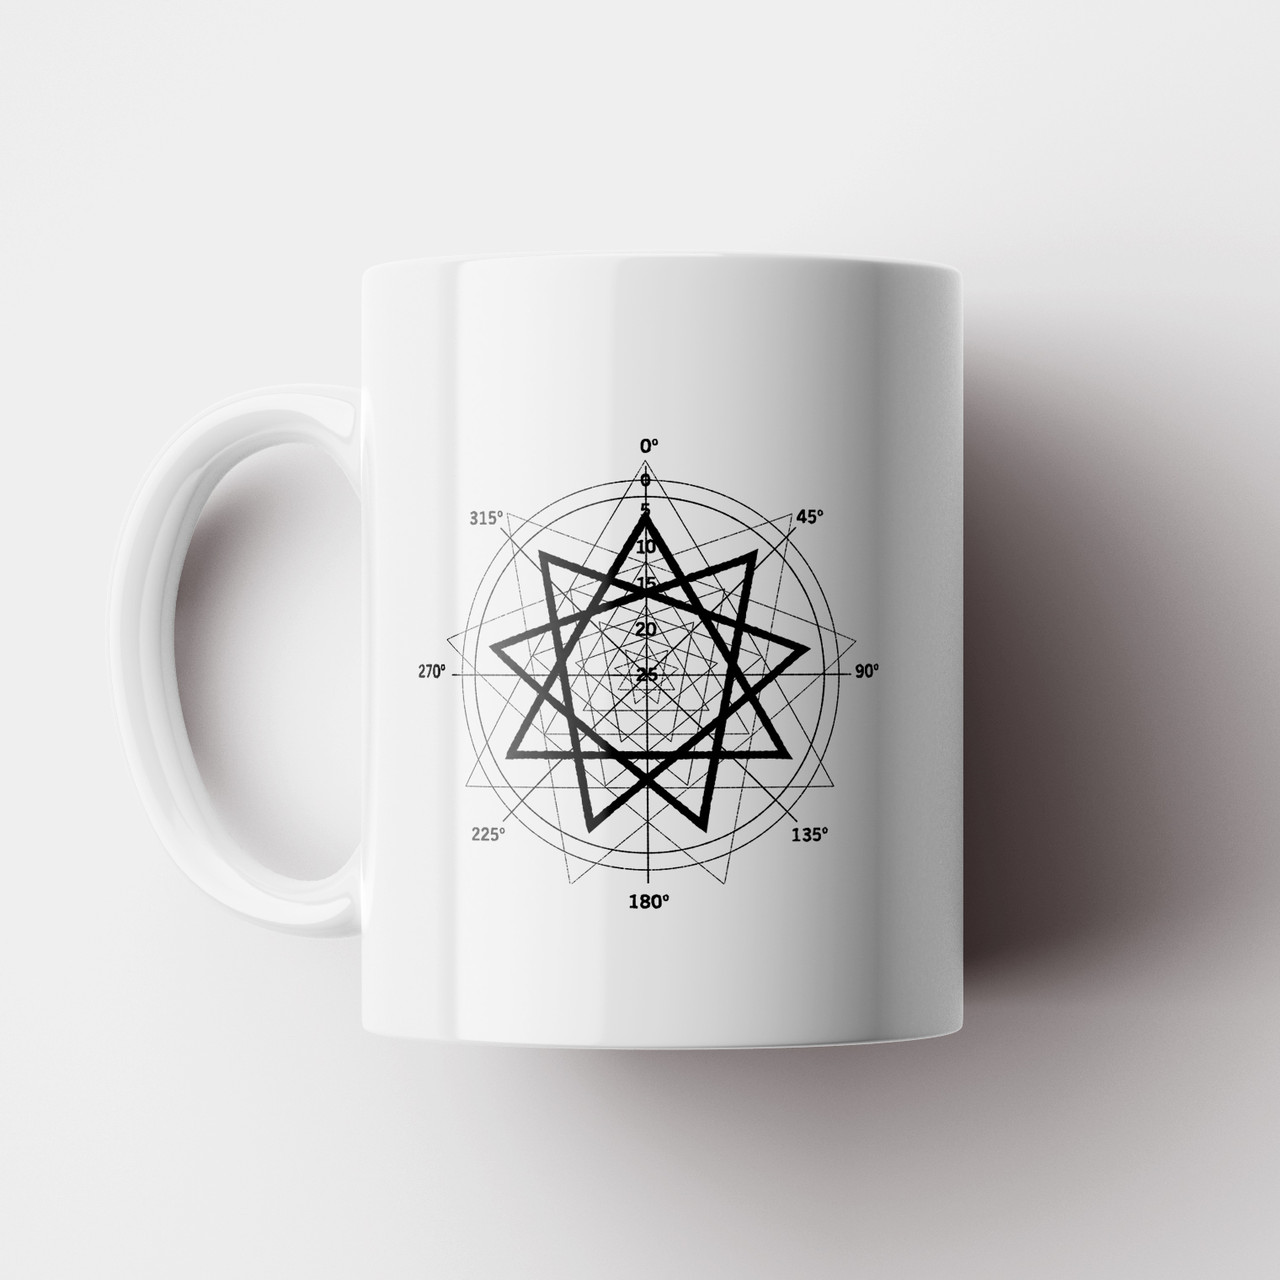 Чашка Slipknot art. Слипнот. Музыка. Metal. Метал. Чашка с фото